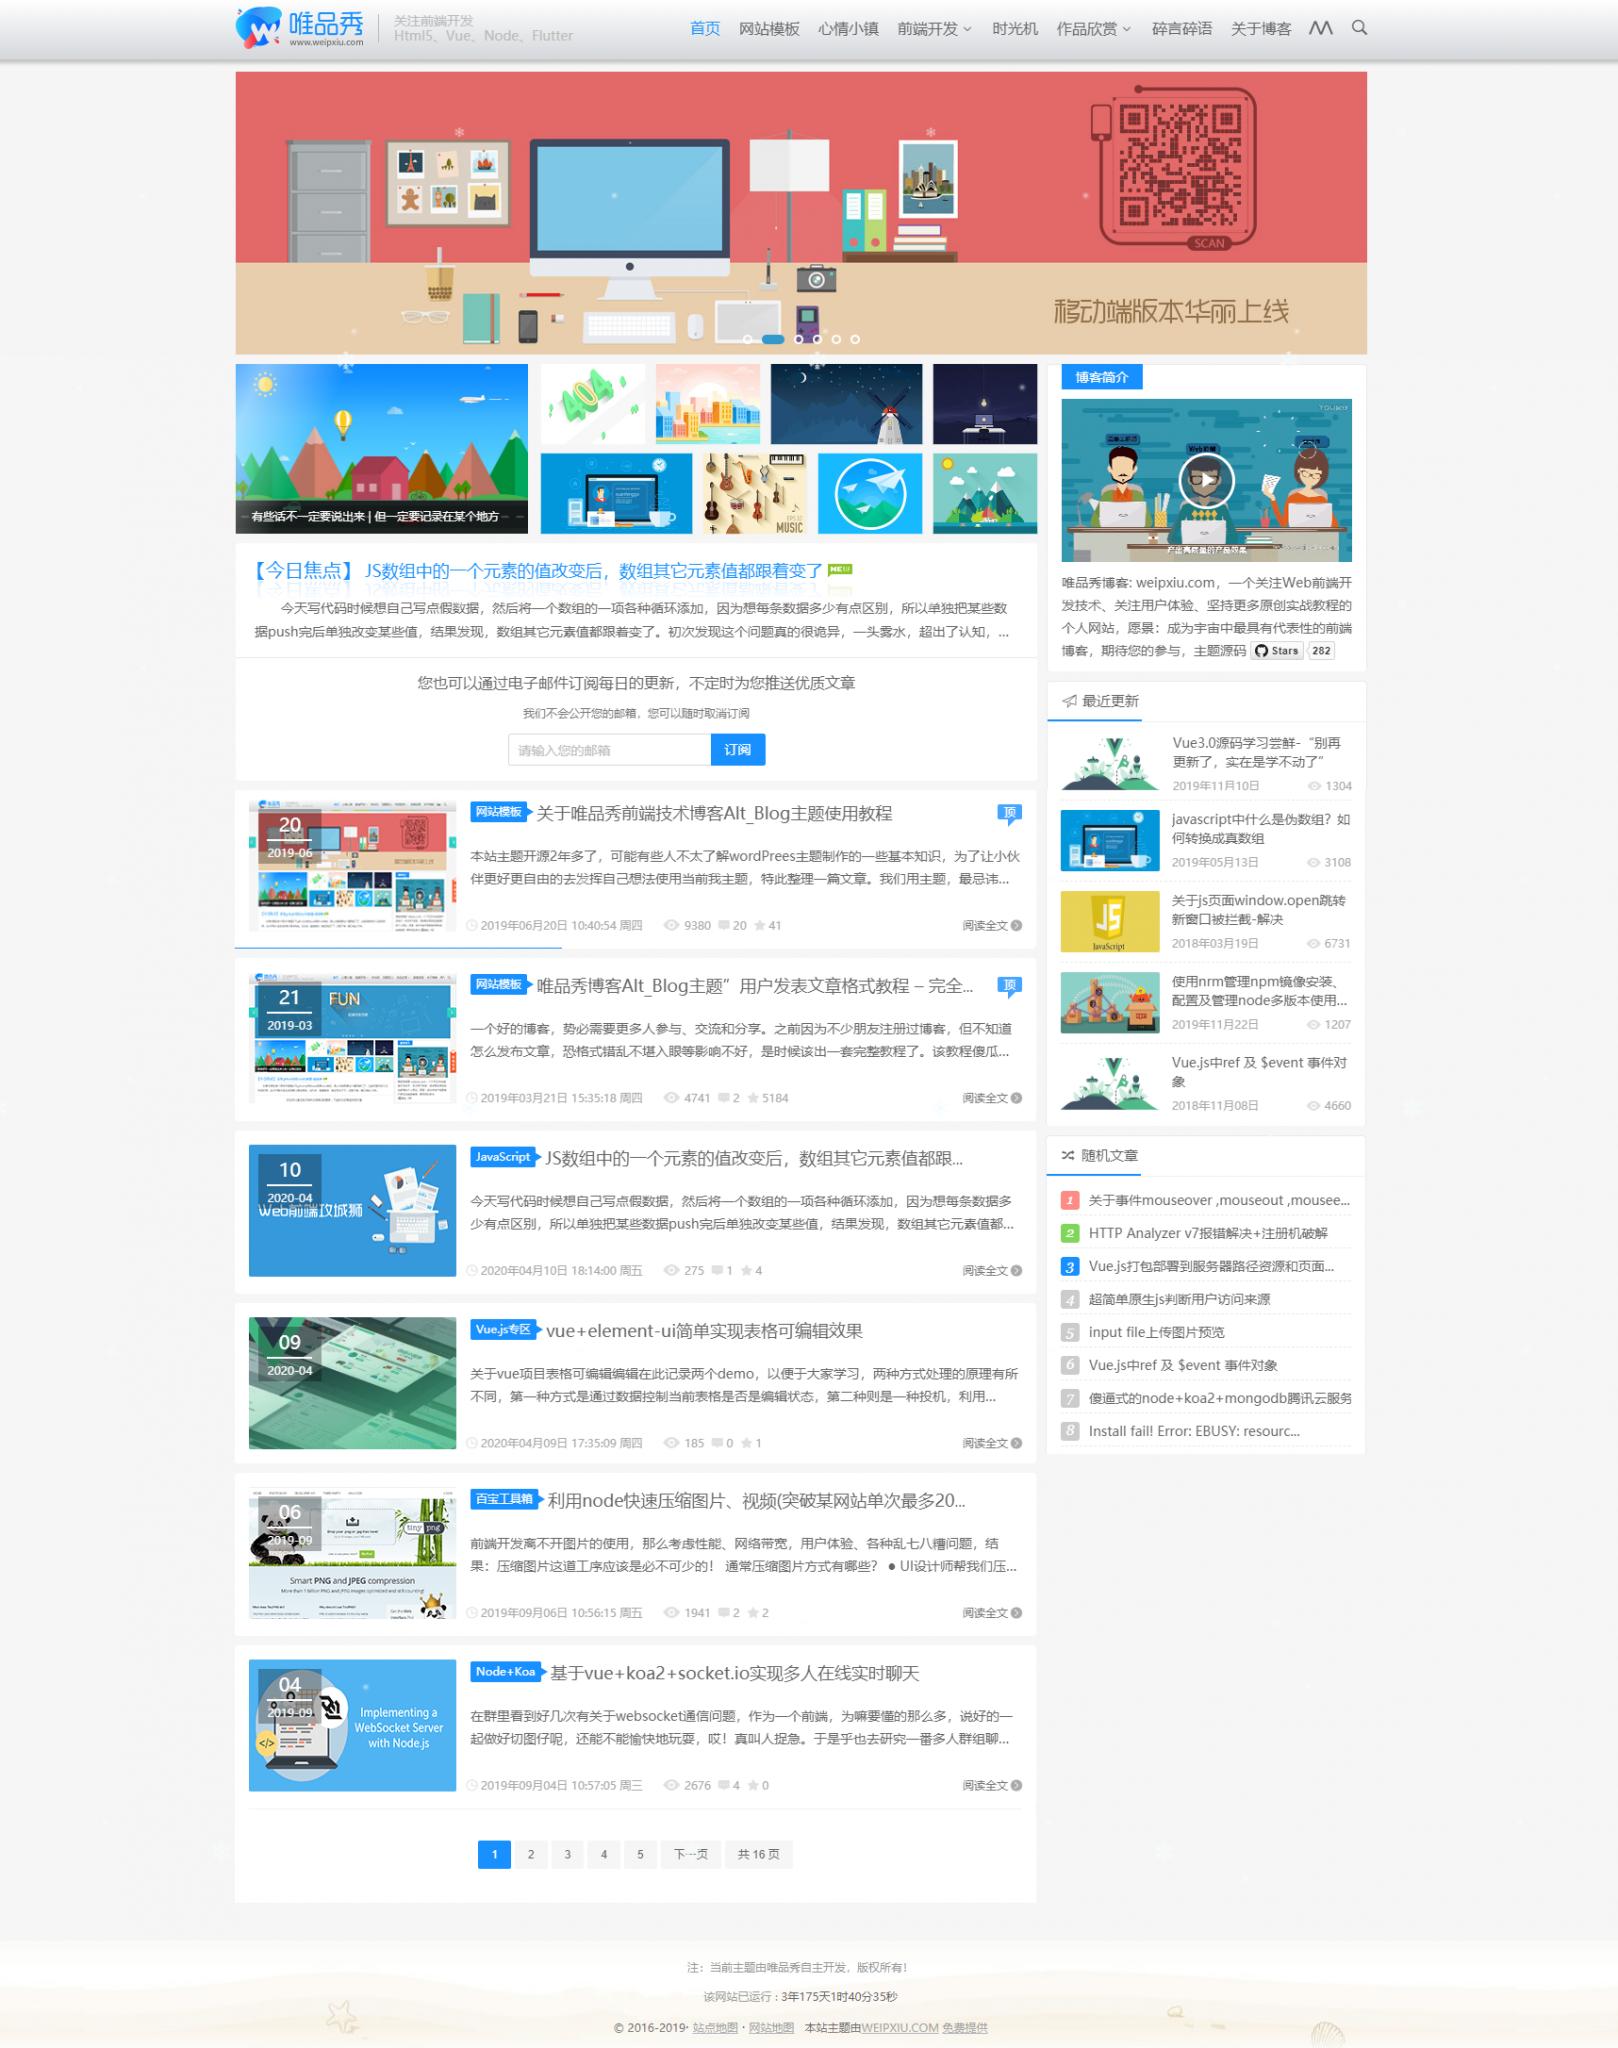 WordPress一款响应式Alt_Blog主题免费分享